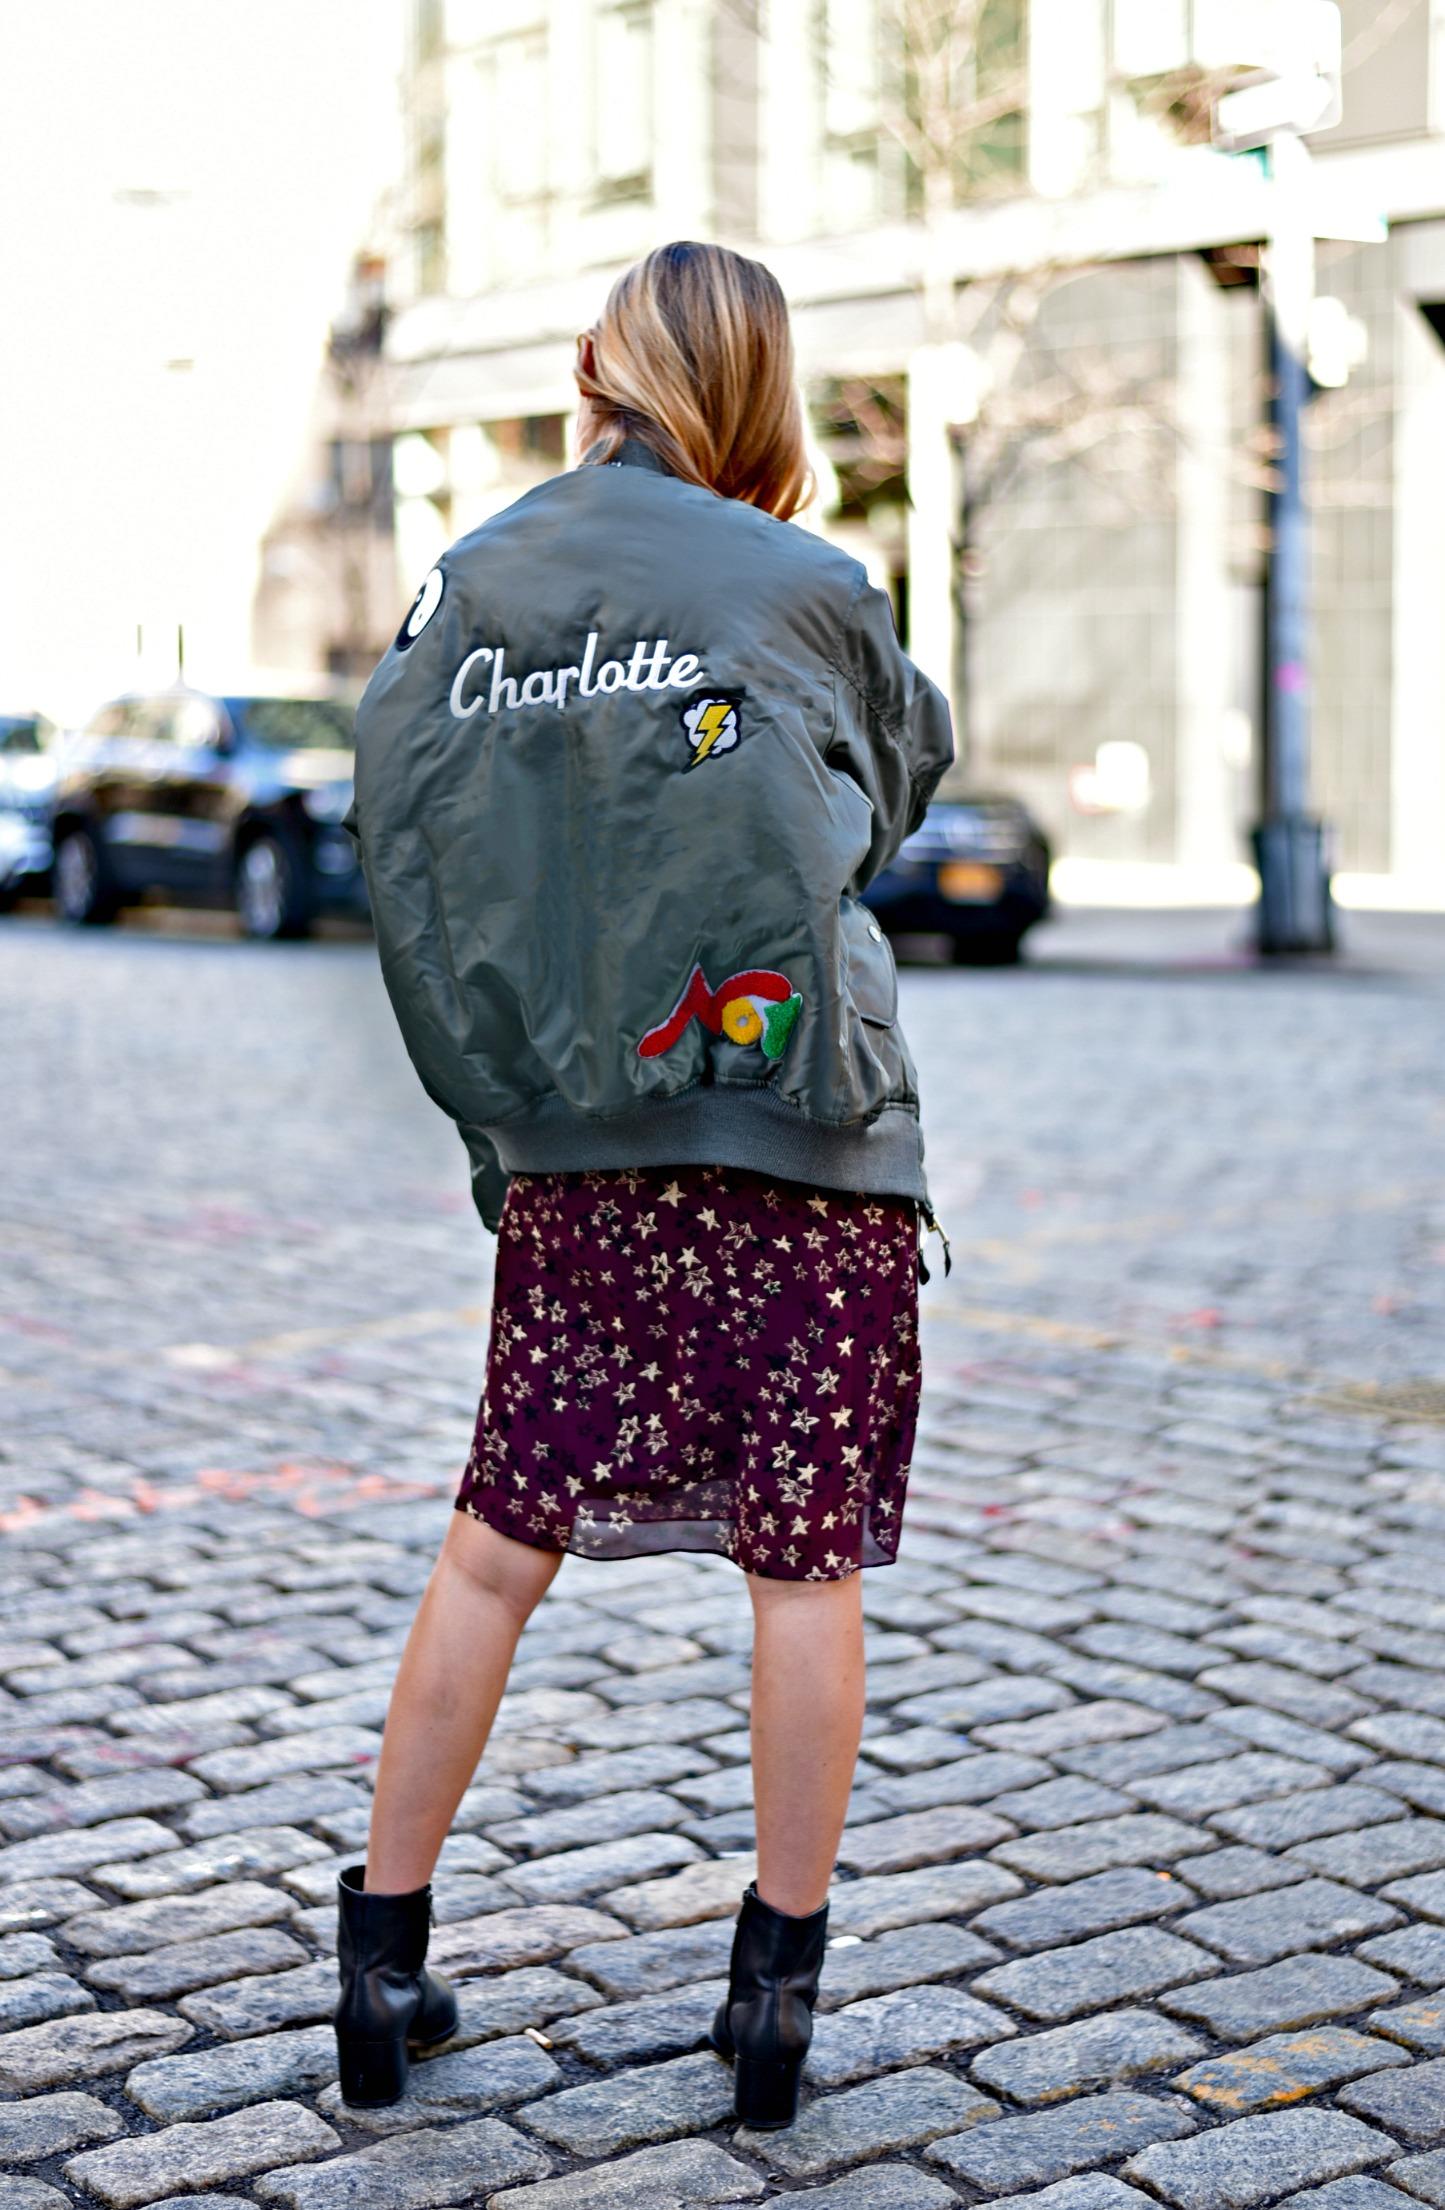 CHARLOTTE BICKLEY YIN 2MY YANG SISTER FASHION BLOGGERS NYC UNEMPLOYED DENIM PERSONALIZED BOMBER JACKET POST 3.jpg